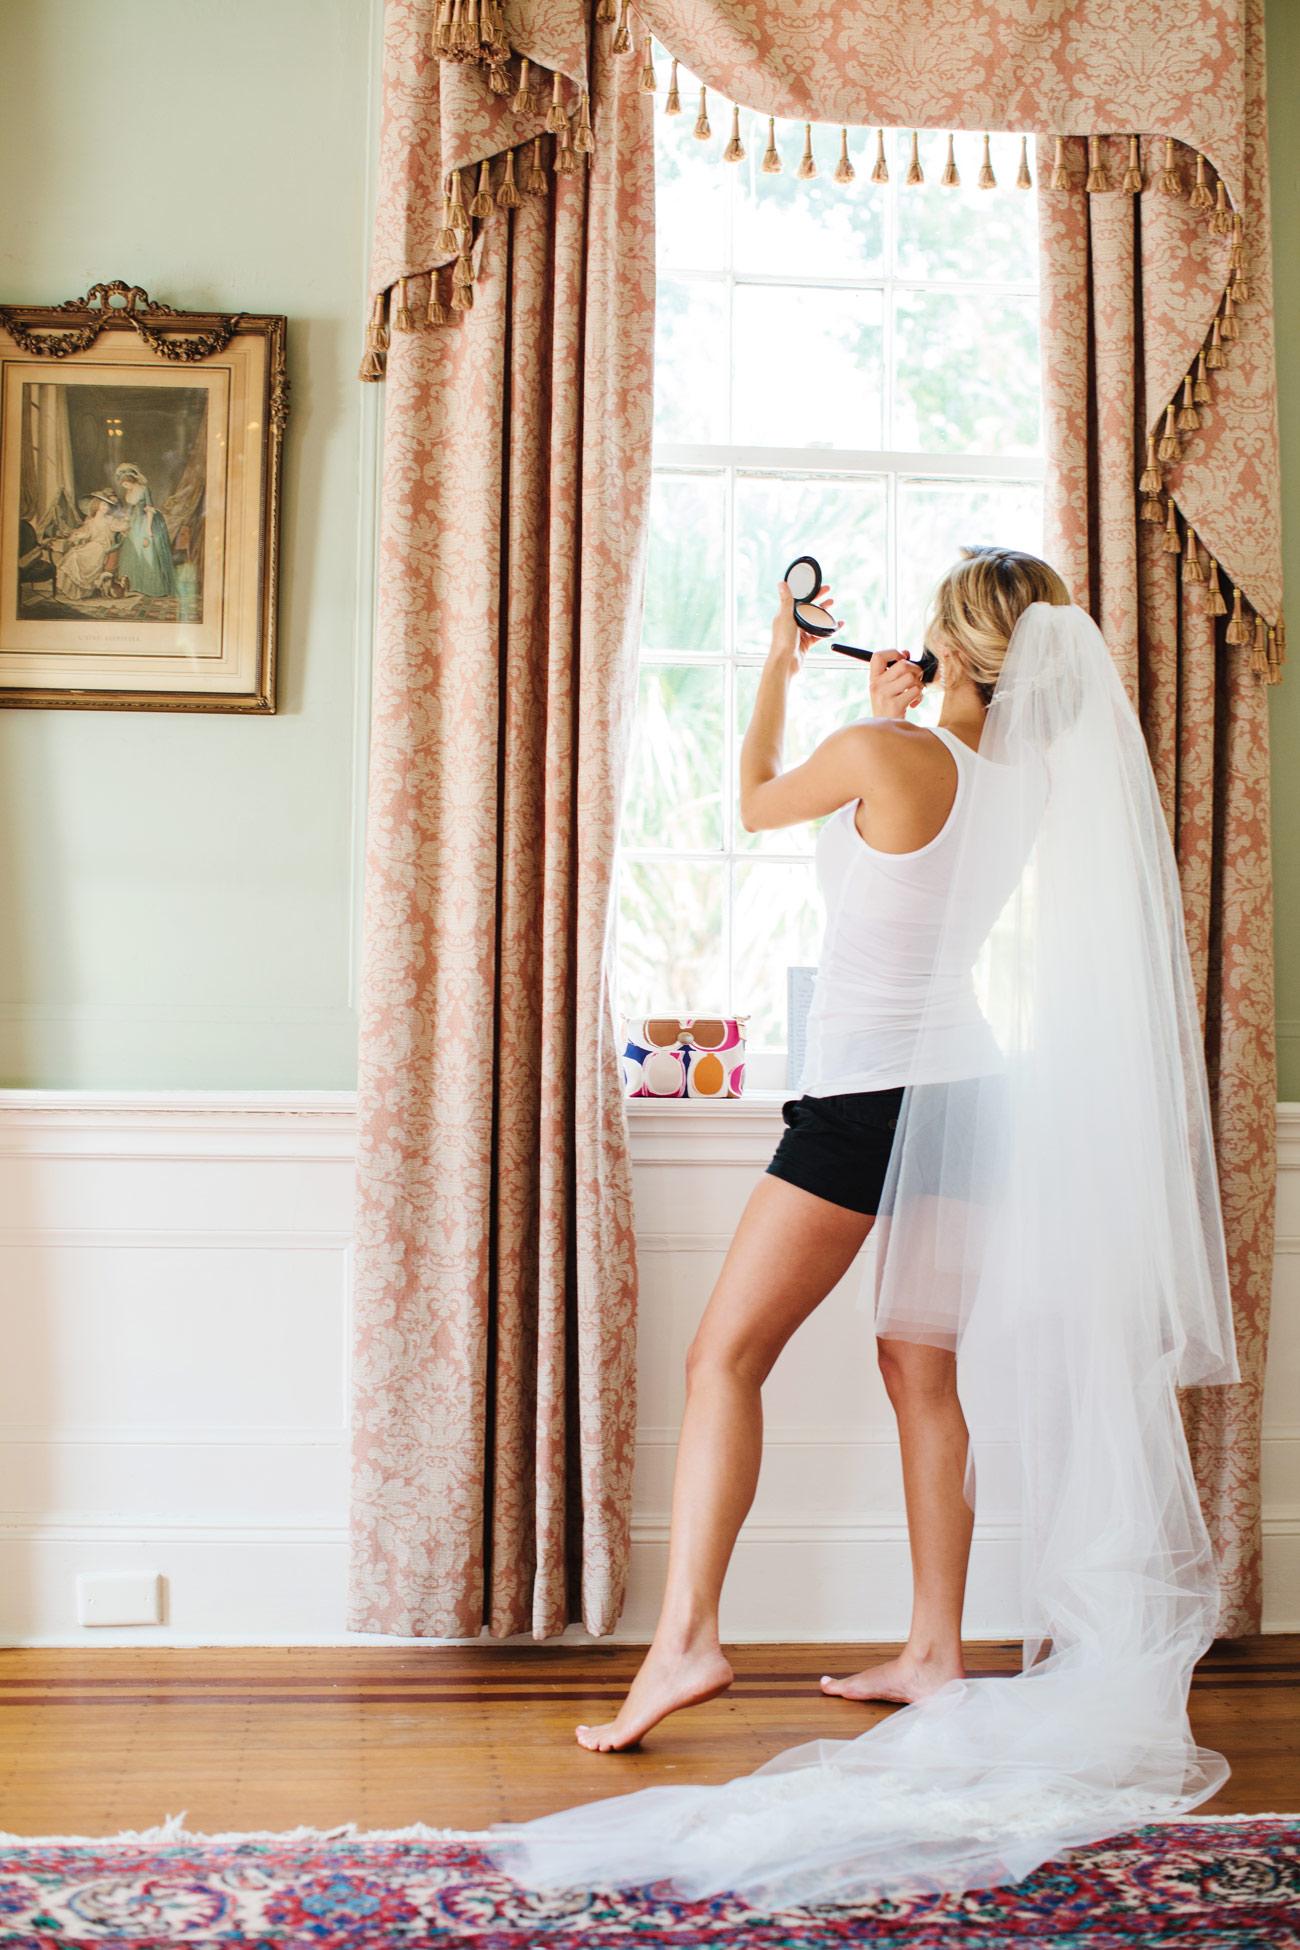 bride getting ready for a wedding at the lowndes grove plantation in charleston, sc destination charleston weddings